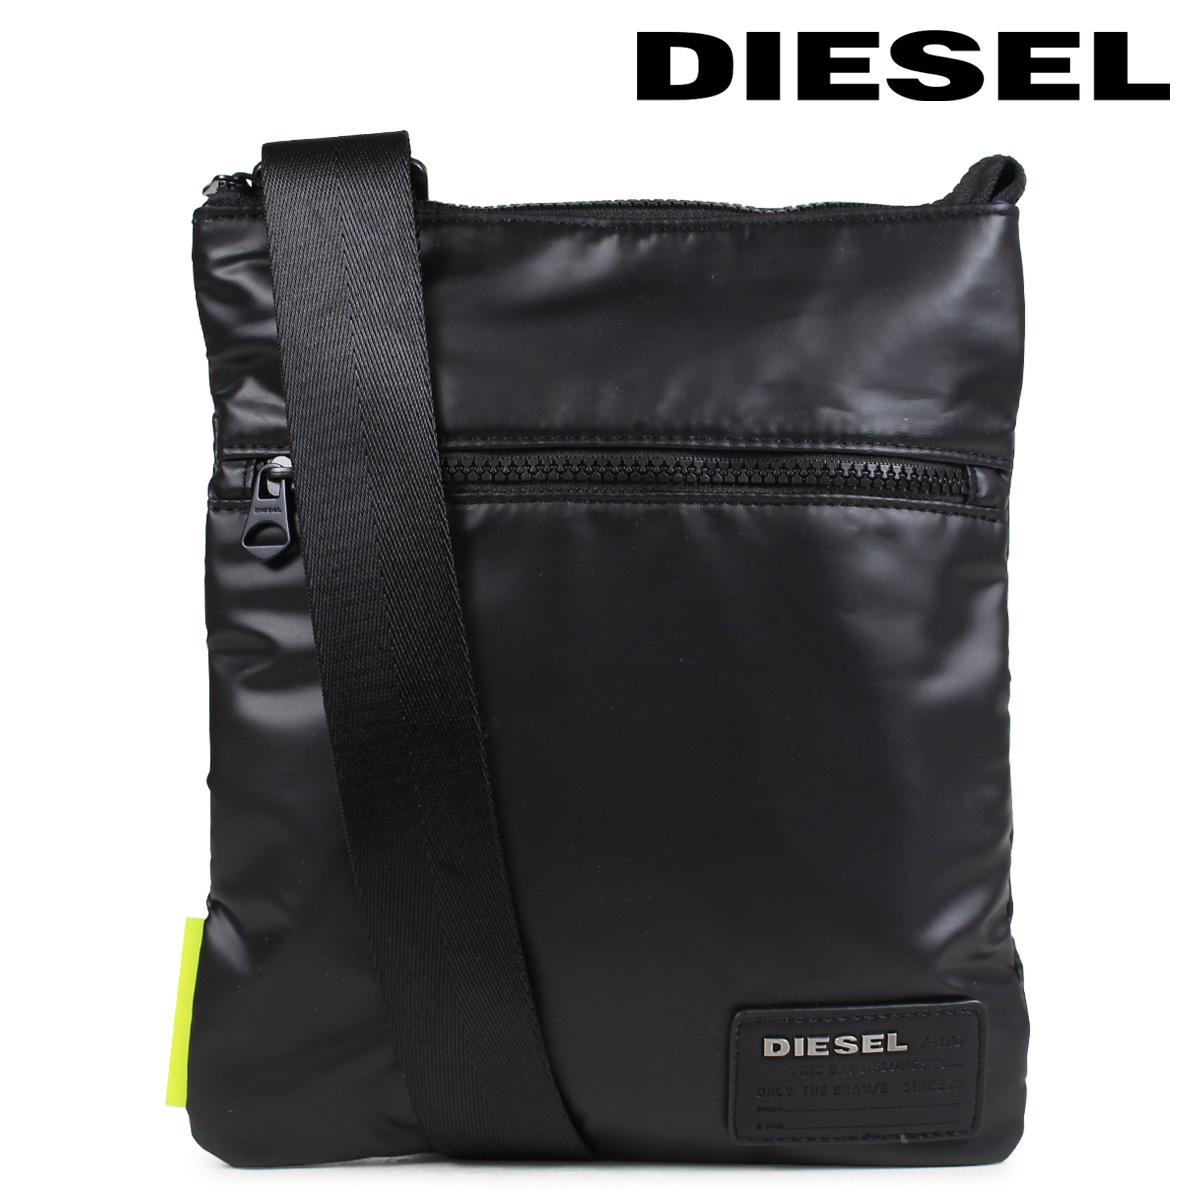 6b67549113 Sugar Online Shop  DIESEL bag men gap Dis diesel shoulder bag F-DISCOVER  CROSS X04813 P1157 T8013 black  6 18 Shinnyu load